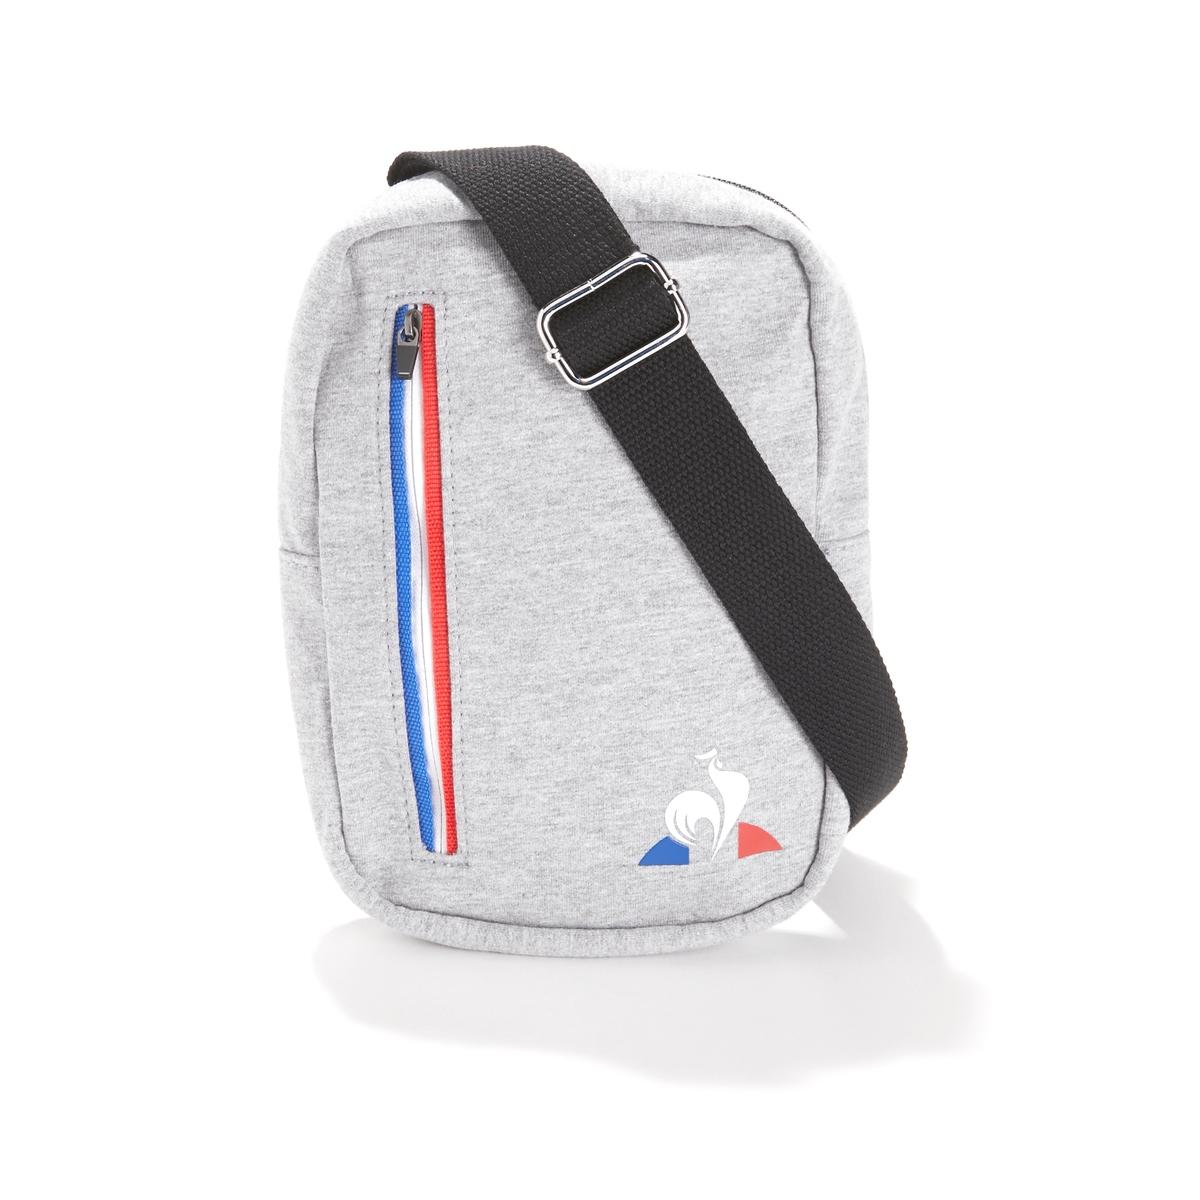 Rucksack ESS Small Item | Taschen > Rucksäcke > Sonstige Rucksäcke | Grau | Baumwolle - Polyester | LE COQ SPORTIF